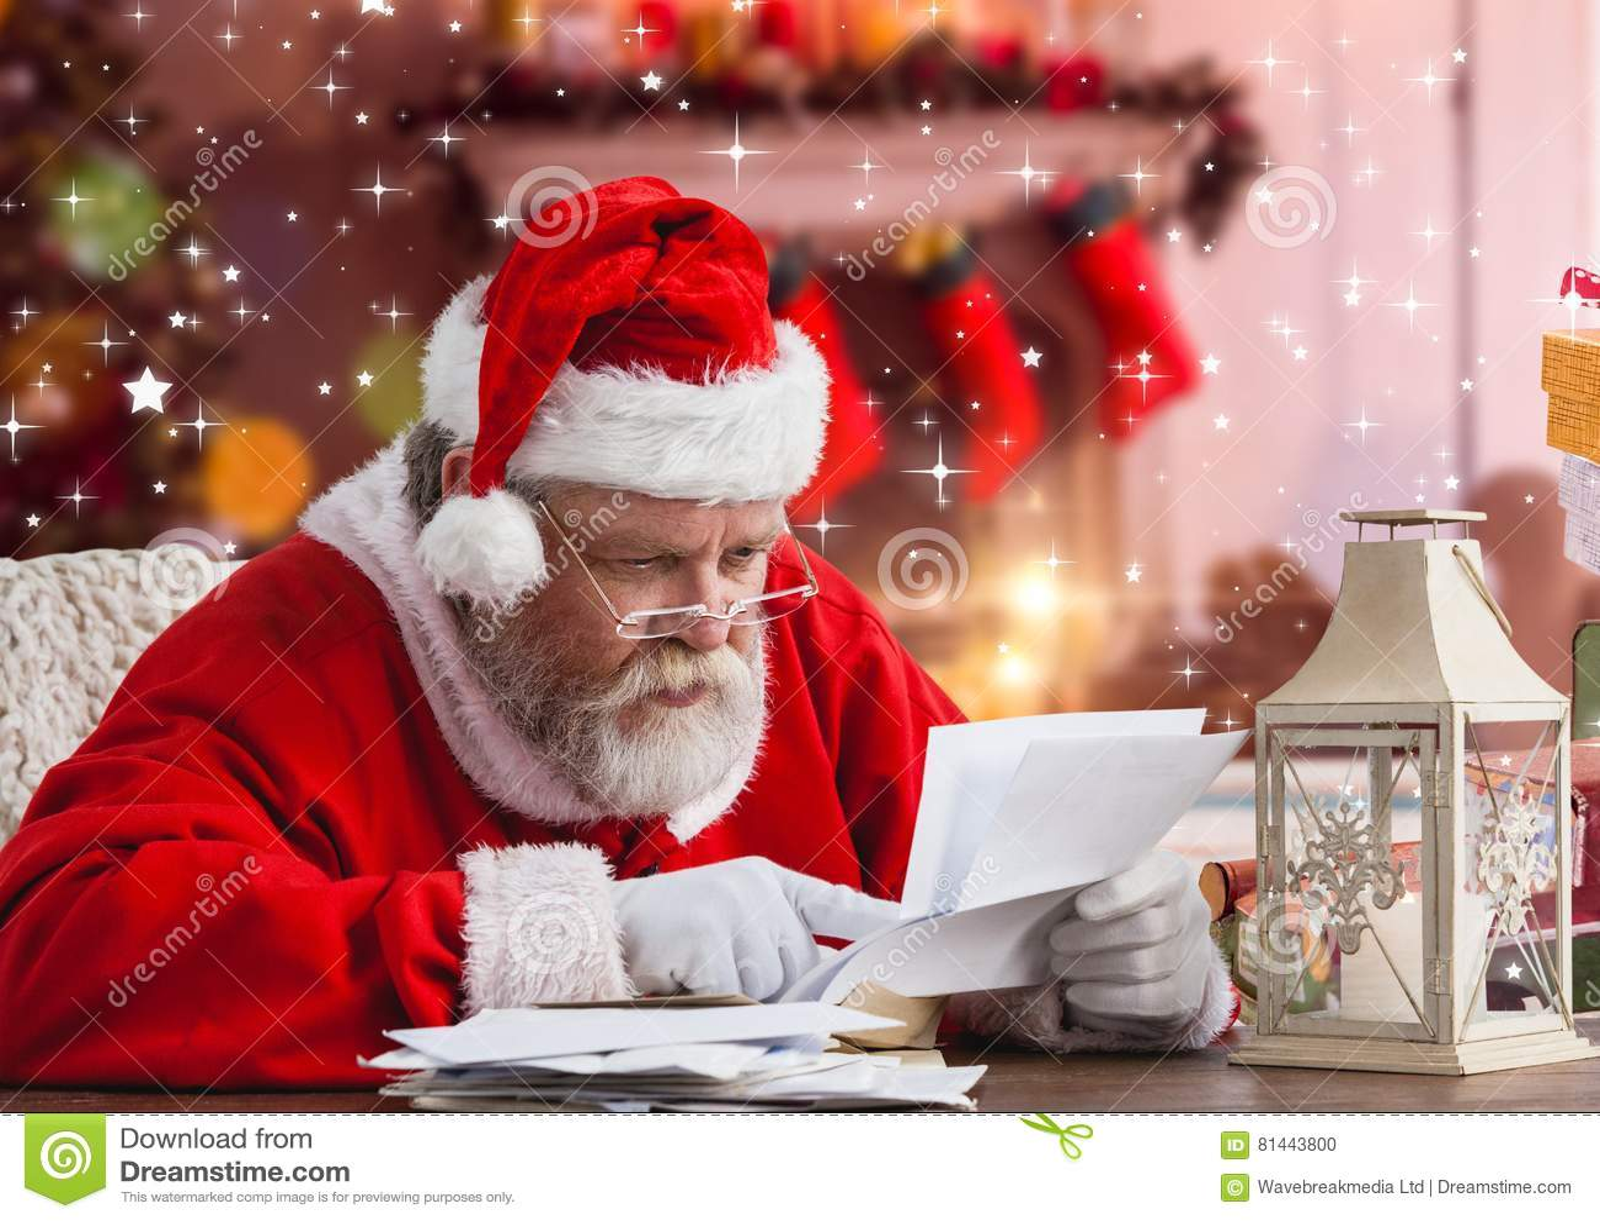 Santa claus reading christmas wish letter stock photo image of download santa claus reading christmas wish letter stock photo image of adult letter spiritdancerdesigns Gallery